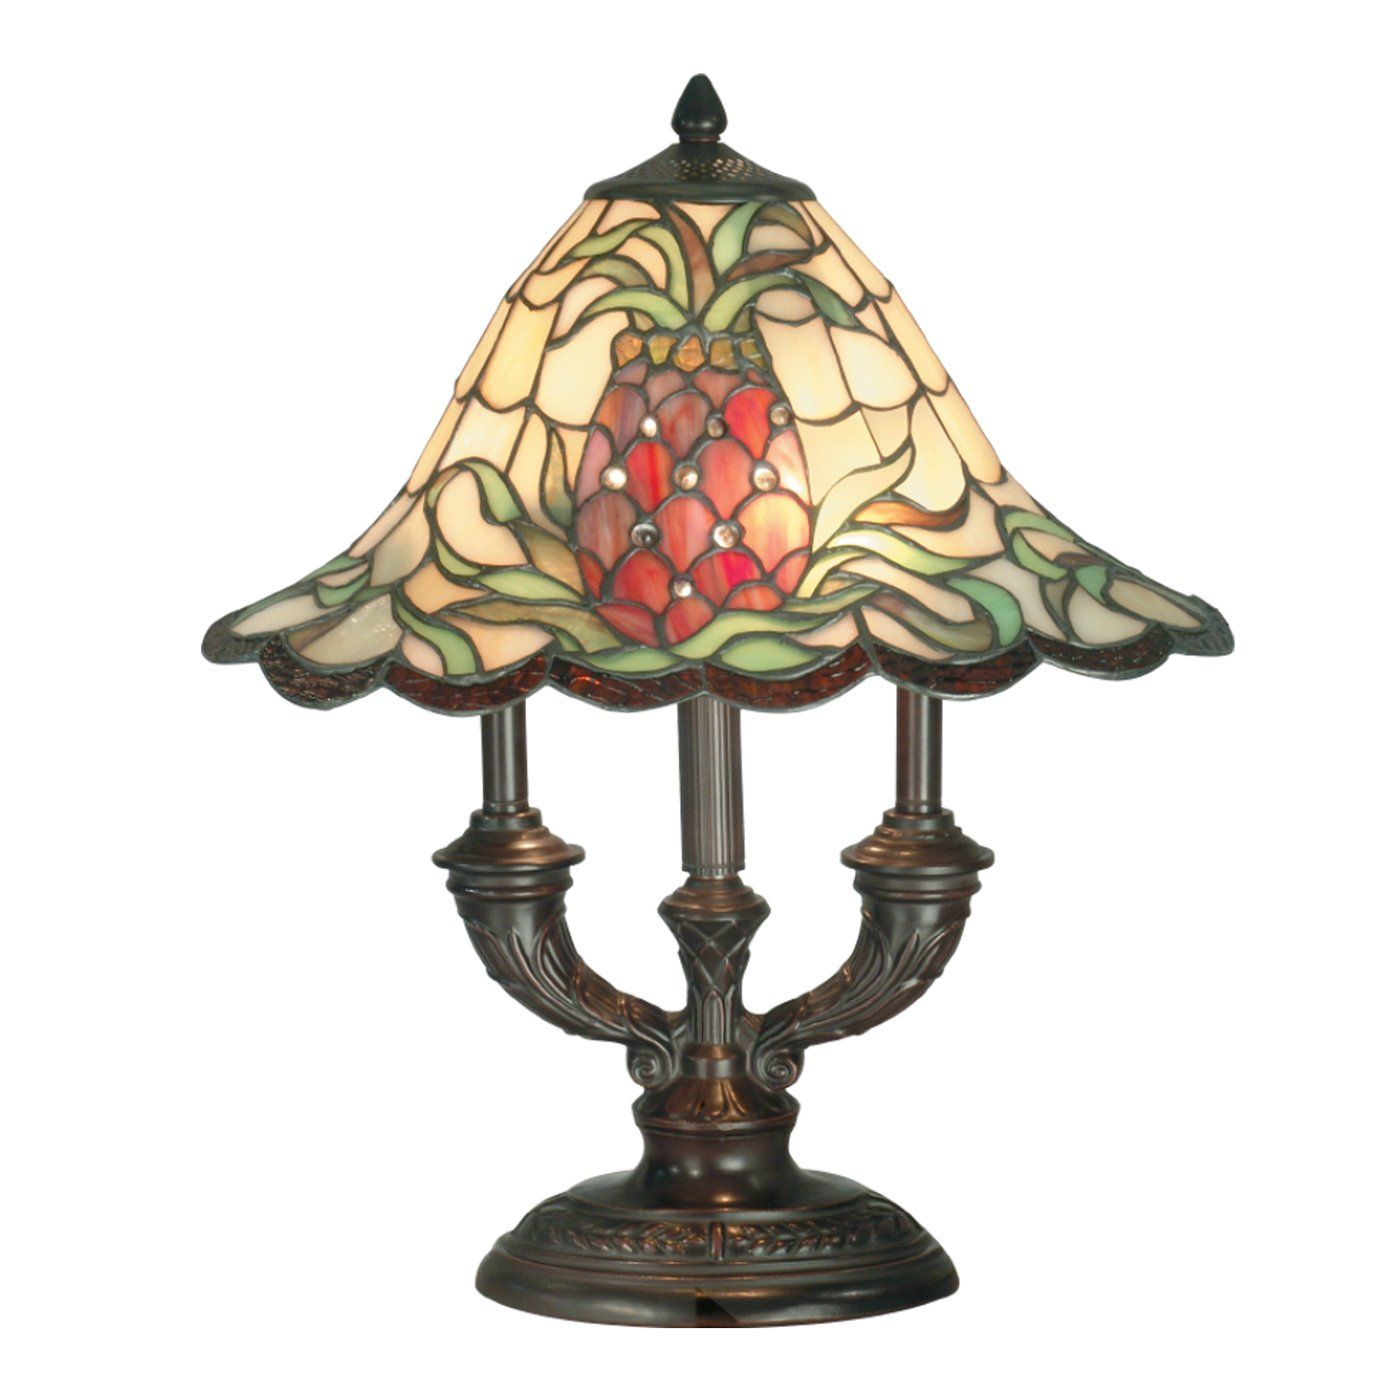 Old Tiffany Lamps Dale Tiffany Tt70698 2 Light Odessa Table Lamp Antique Brass Art Glass Lamp Tiffany Table Lamps Art Glass Table Lamp